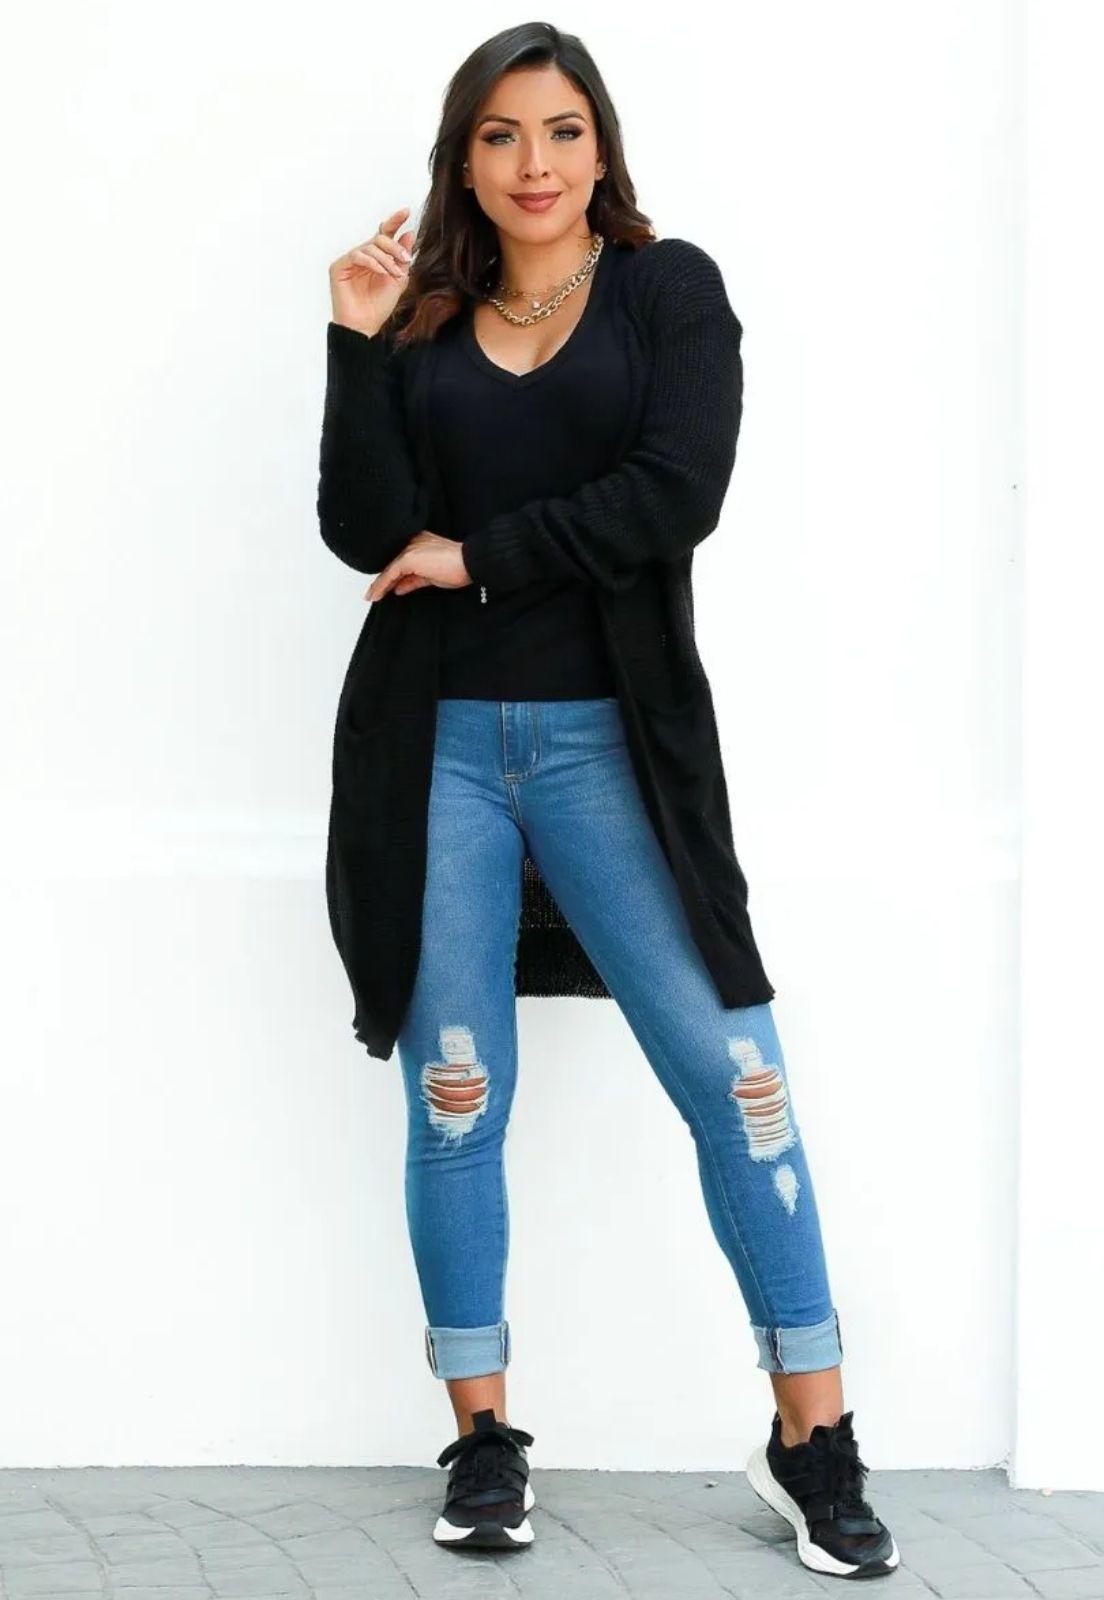 Casaco Cardigan Inverno Feminino Liso Aberto com Bolso  - ModaStore